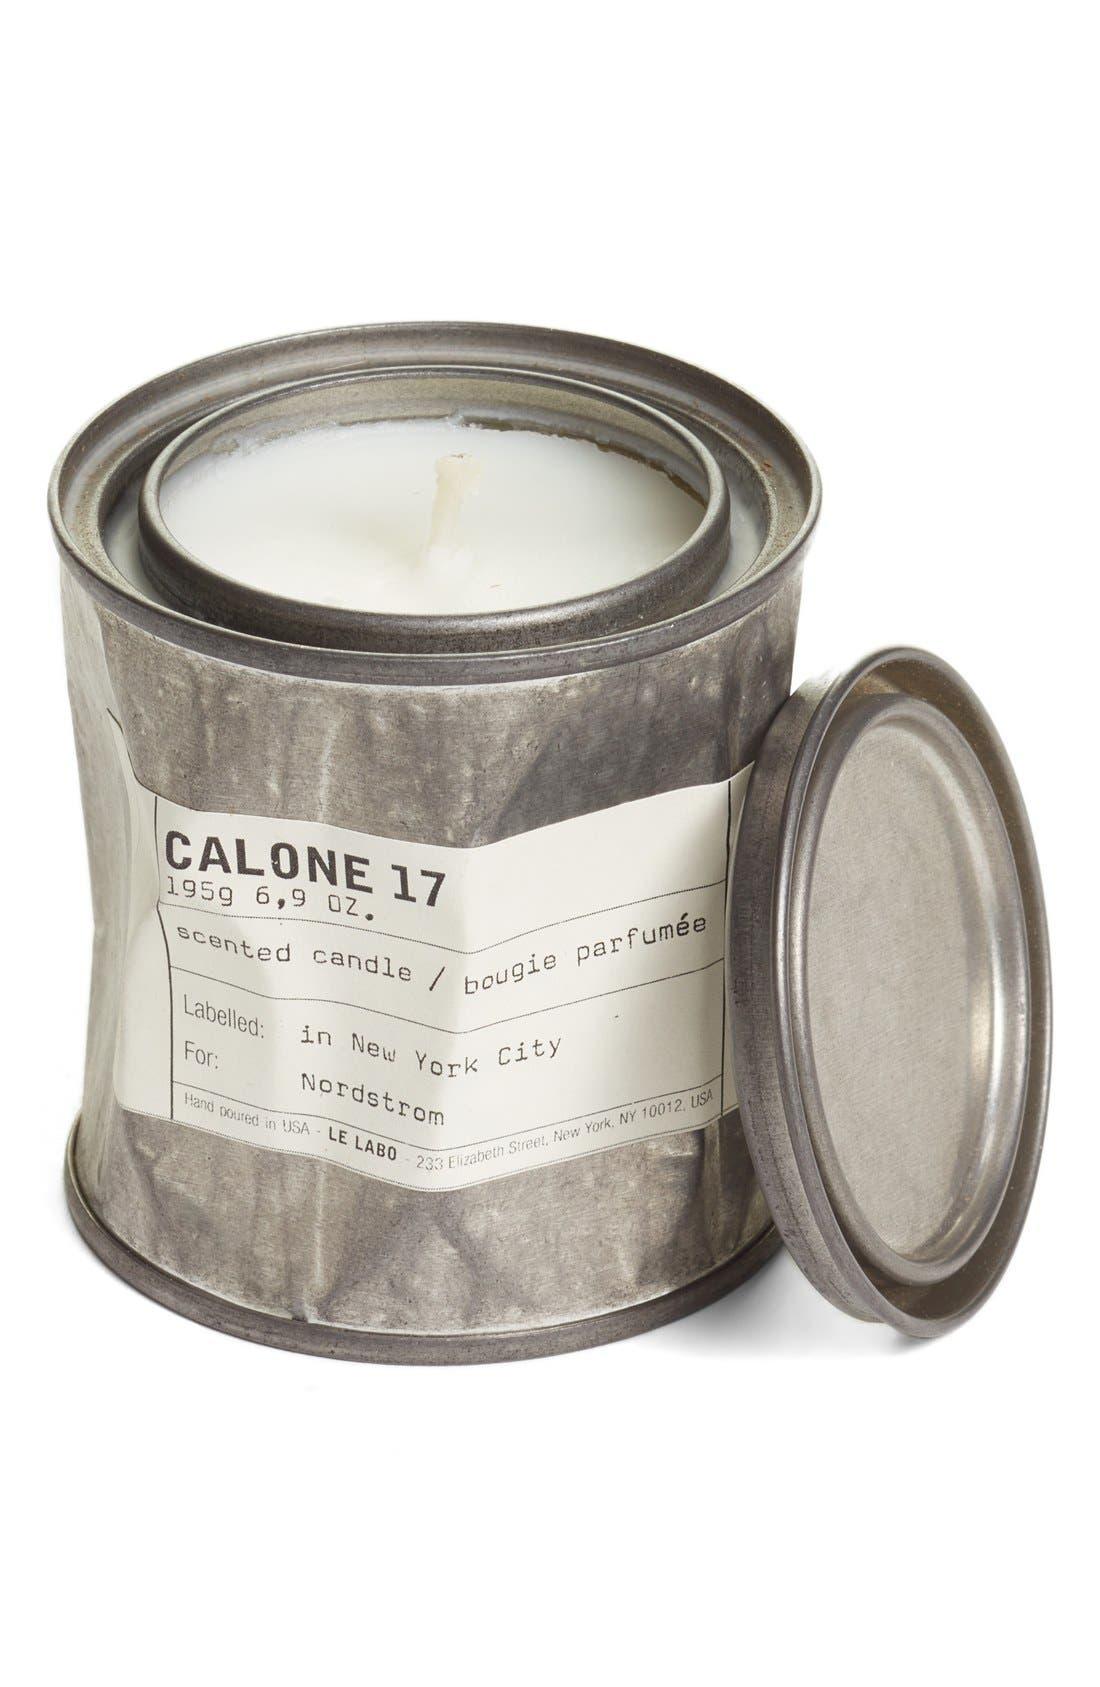 Le Labo 'Calone 17' Vintage Candle Tin